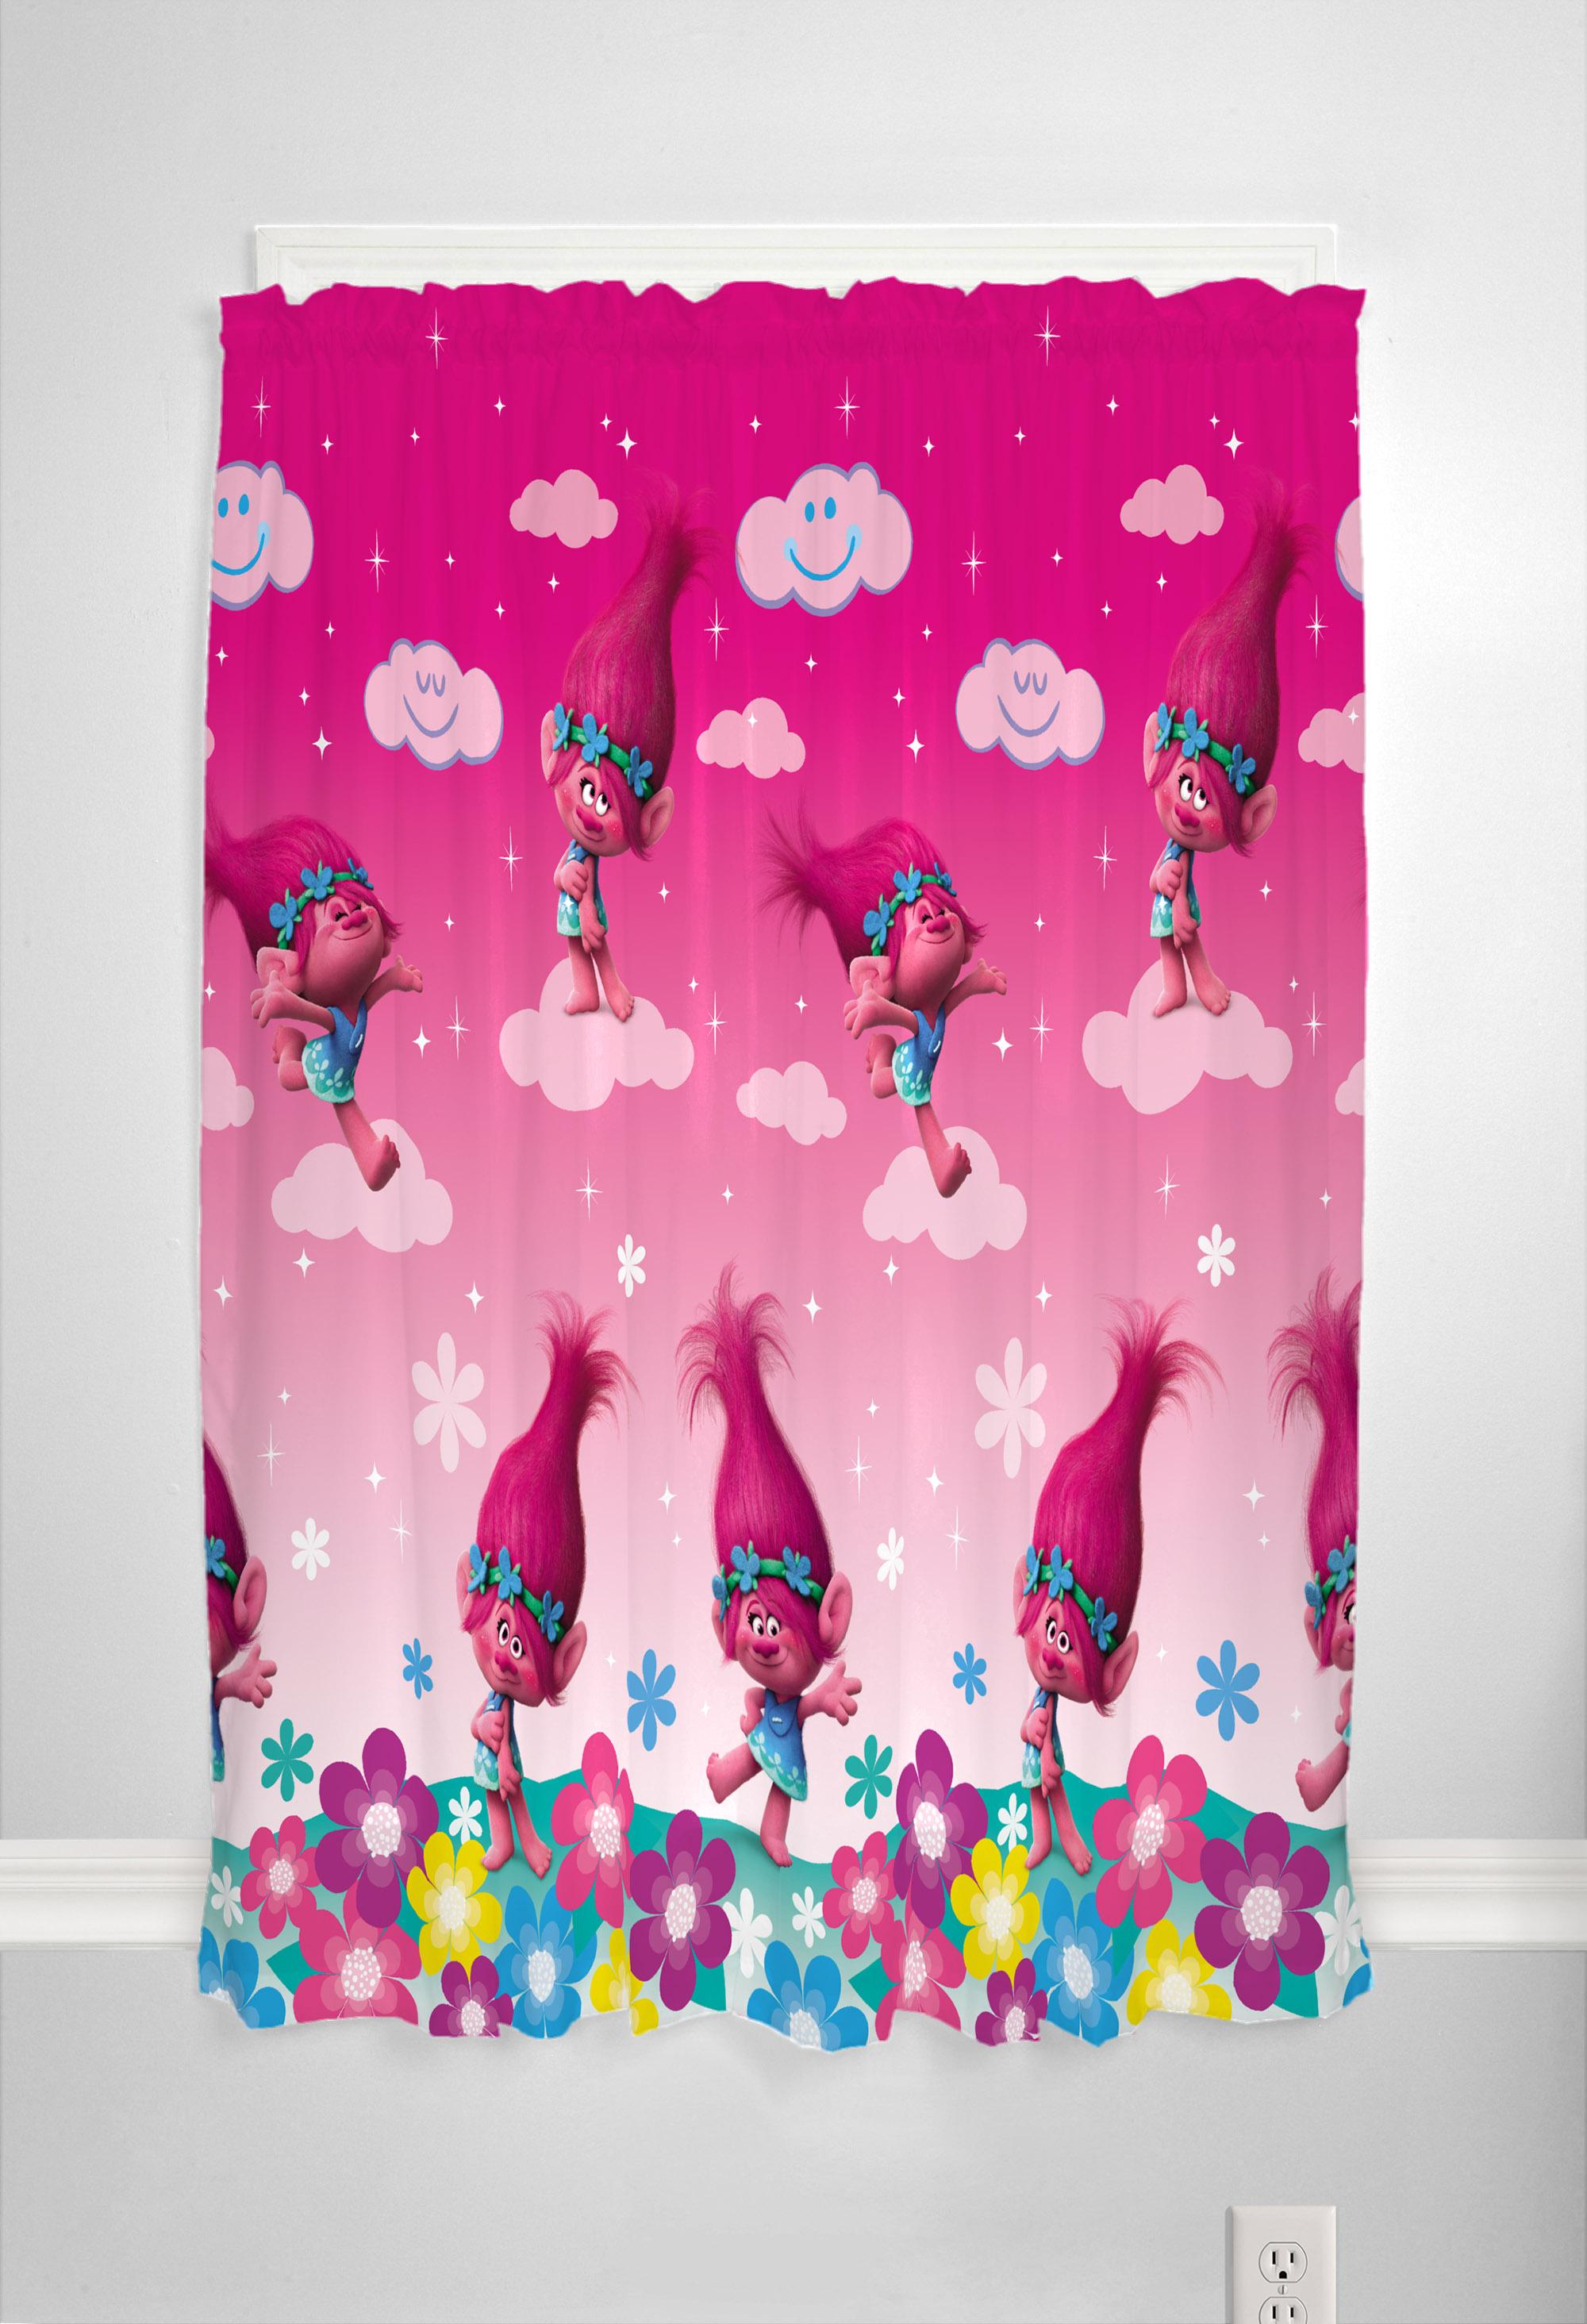 Disney Trolls Curtains Trolls Nursery 101 Dalmatians Jungle Book Shopkins Disney Girl Boy Curtains Valance Disney Valance Curtain Panels